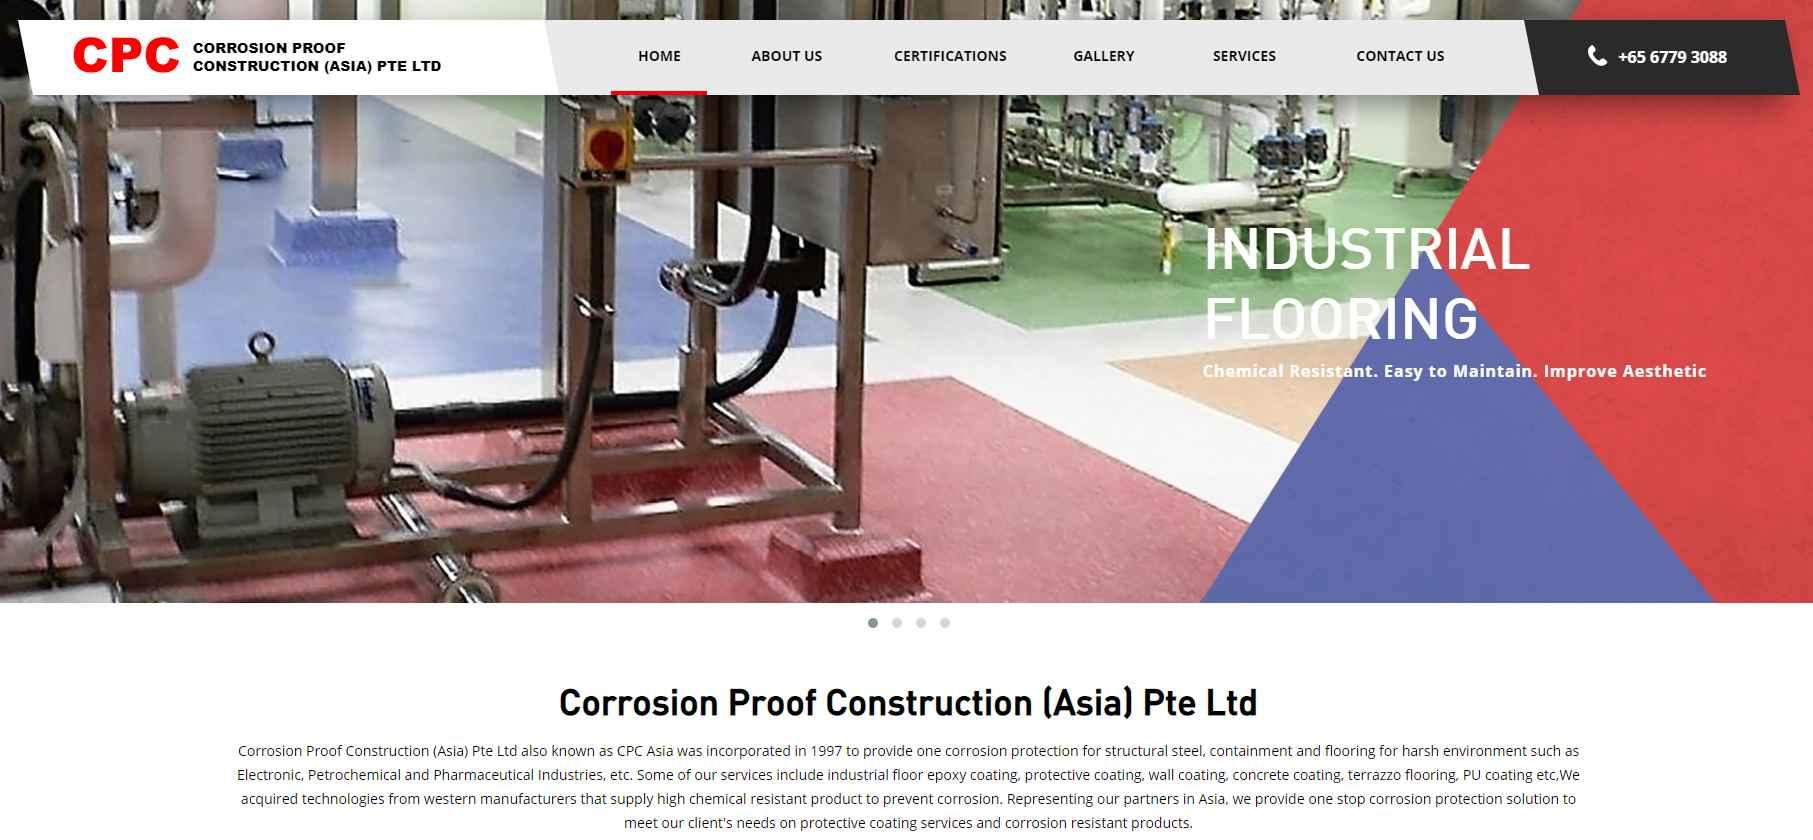 cpc asia Top Epoxy Flooring Provider in Singapore